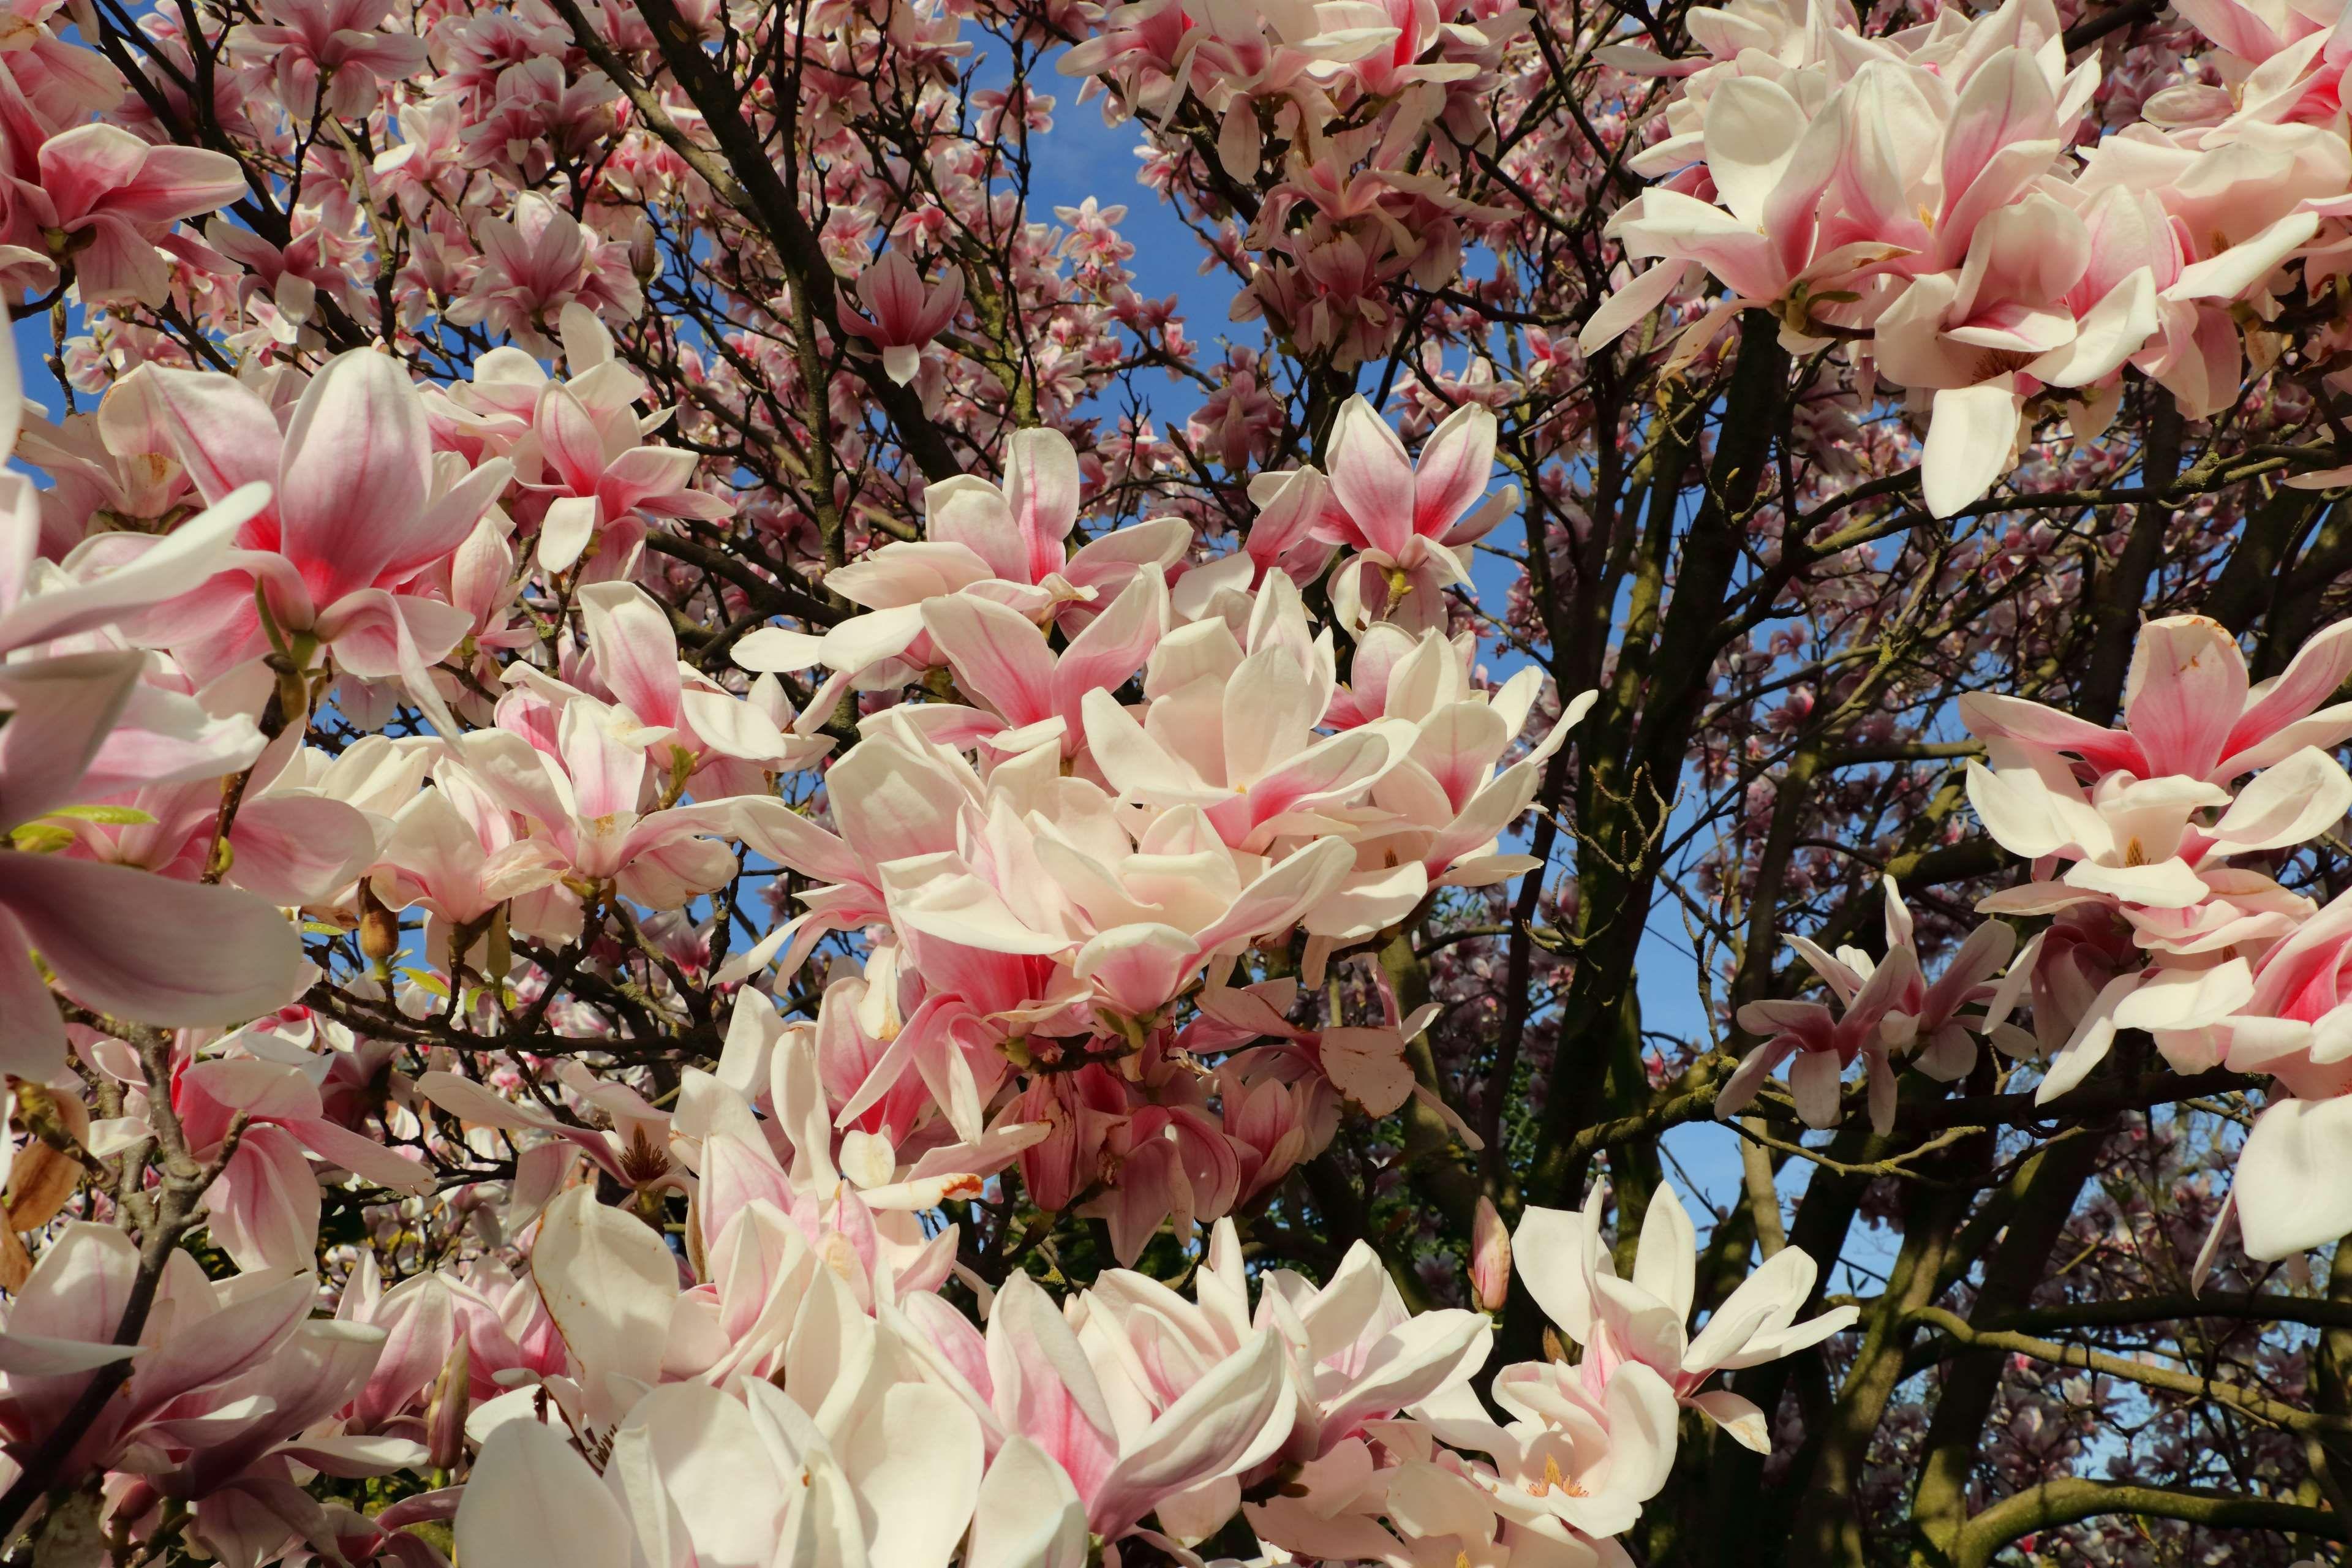 Bloom Blossom Bud Flowers Frhlingsblher Magnolia Magnolia Tree